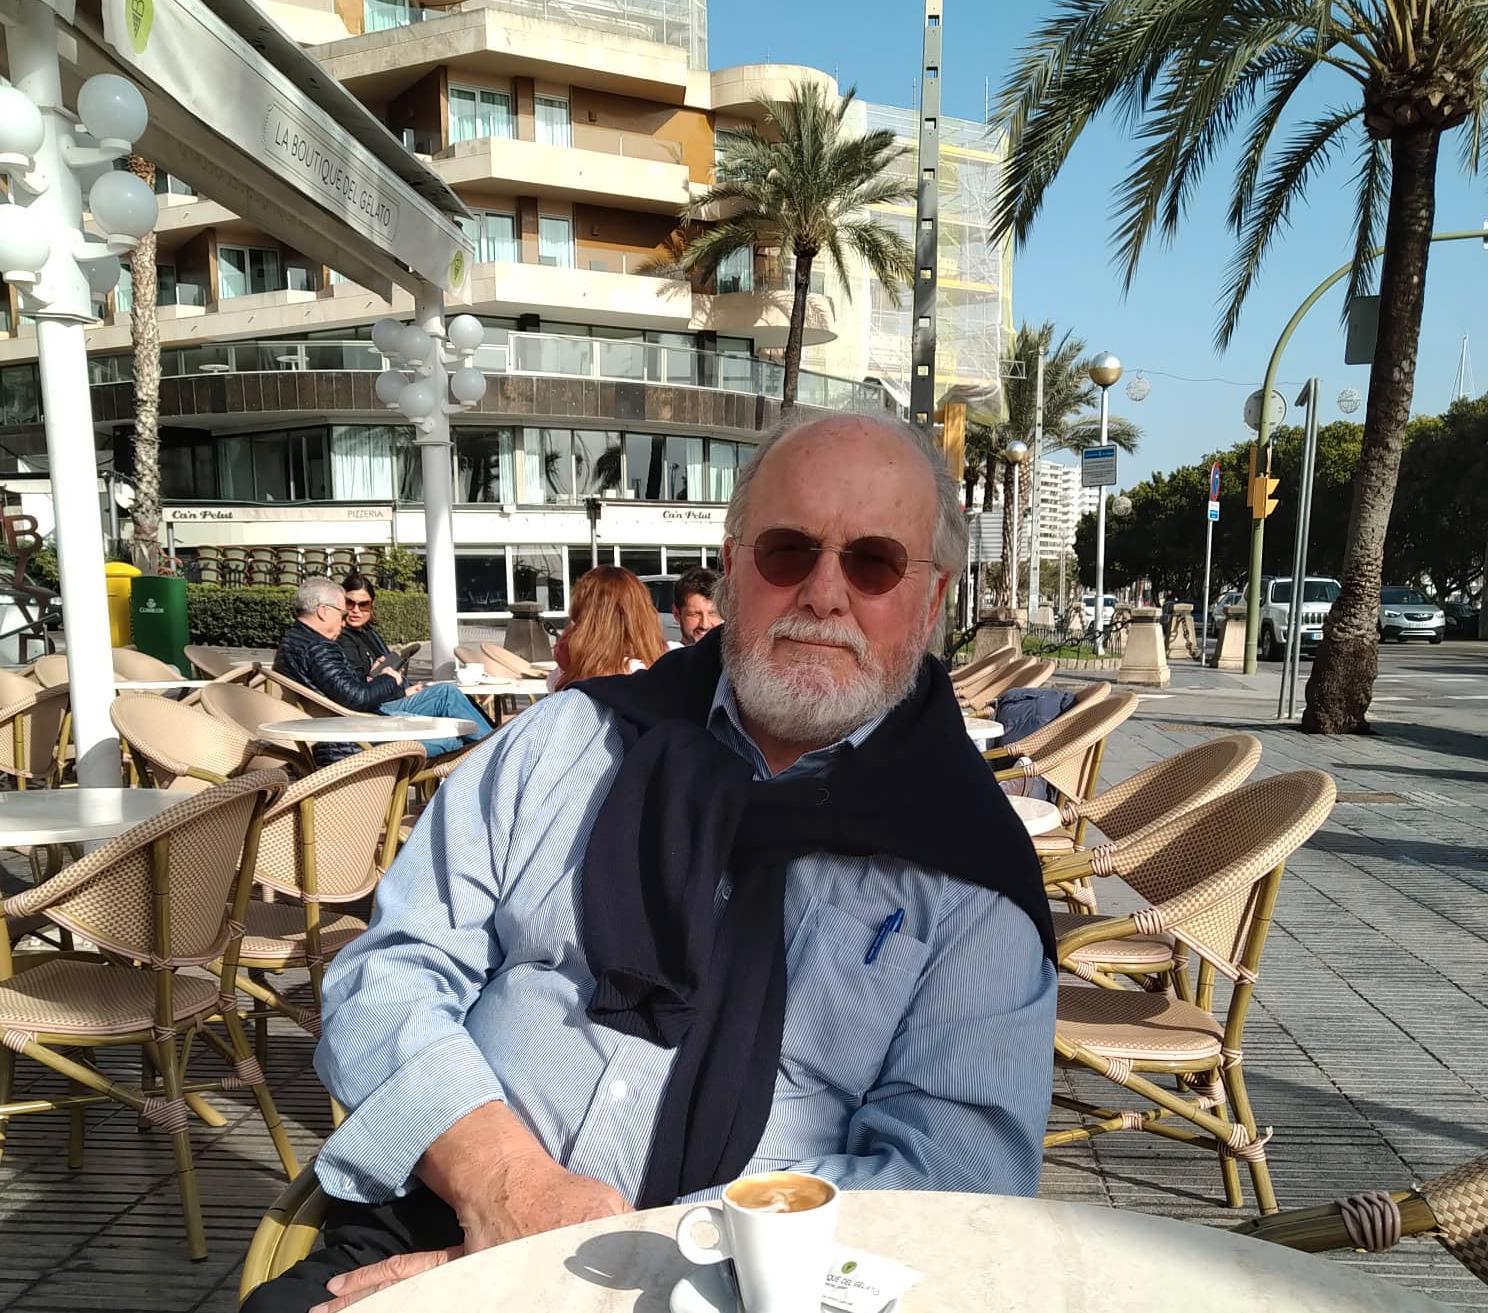 Hans Erik tar gärna en kaffe på Paseo Maritimo i Palma de Mallorca.